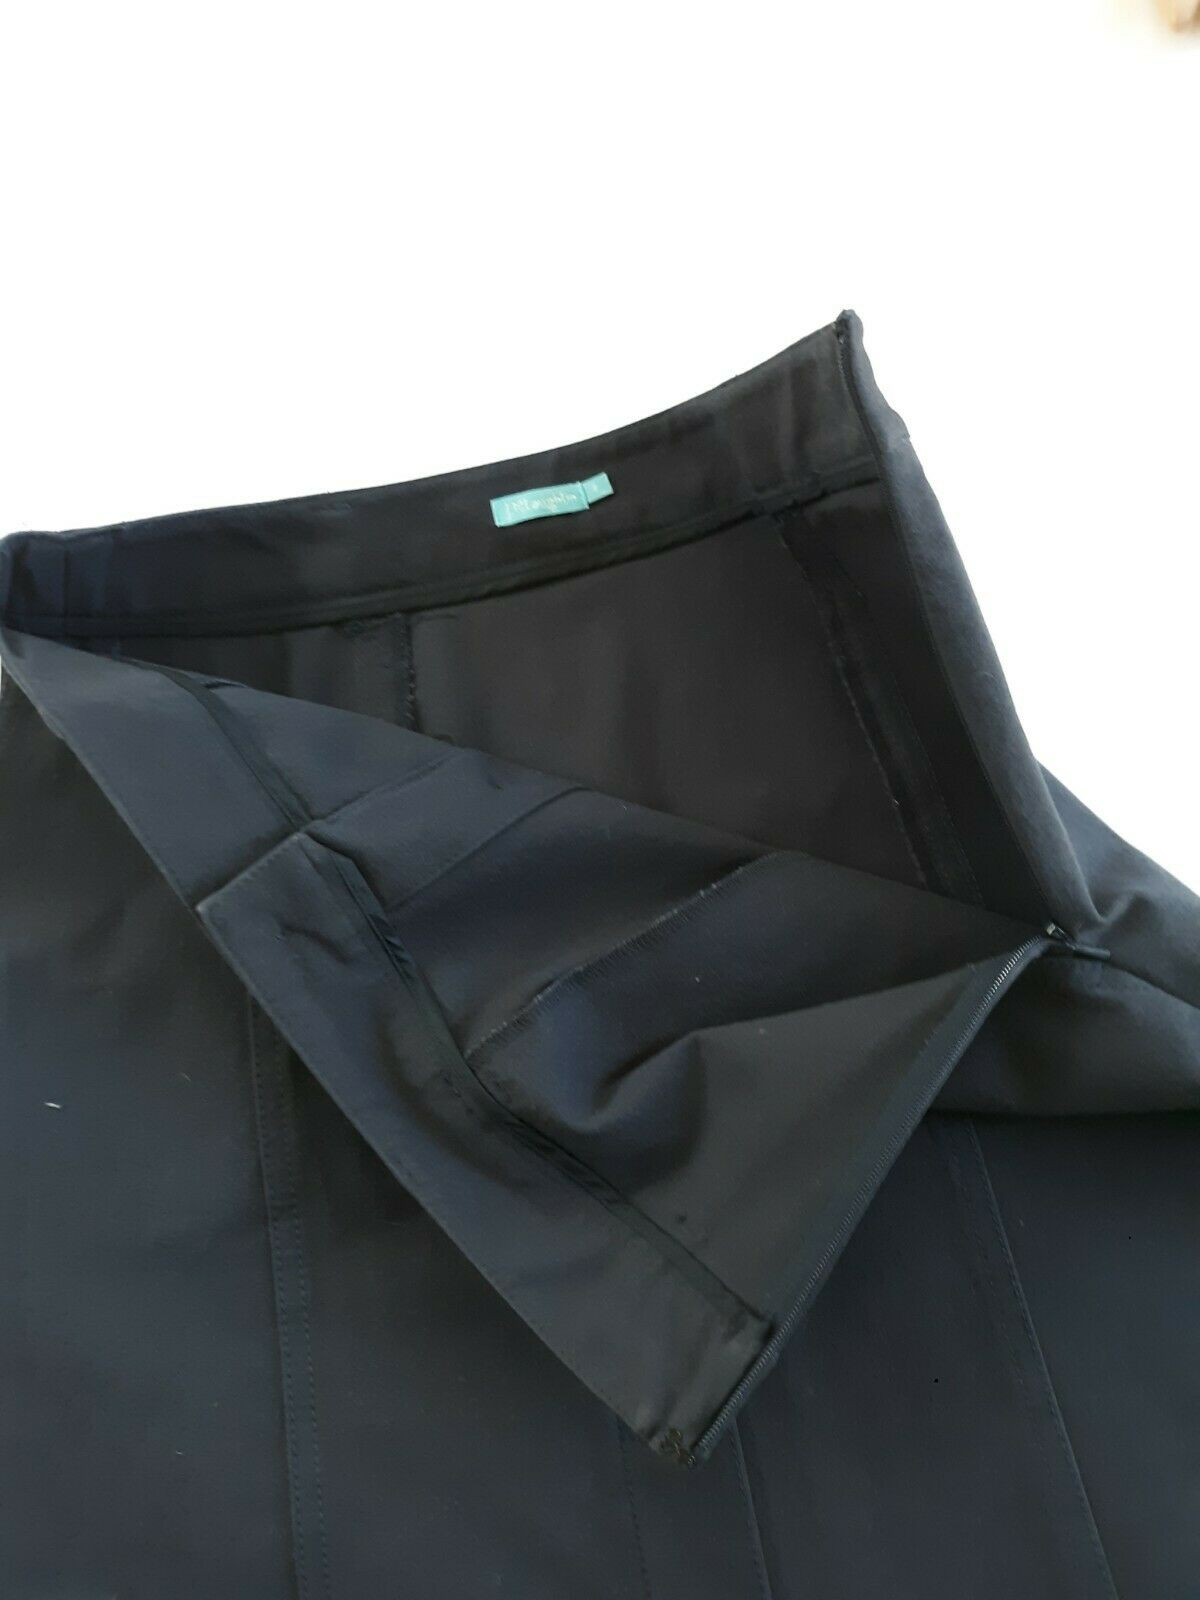 J McLaughlin Teal Button Front A Line Skirt Size 2 - image 10